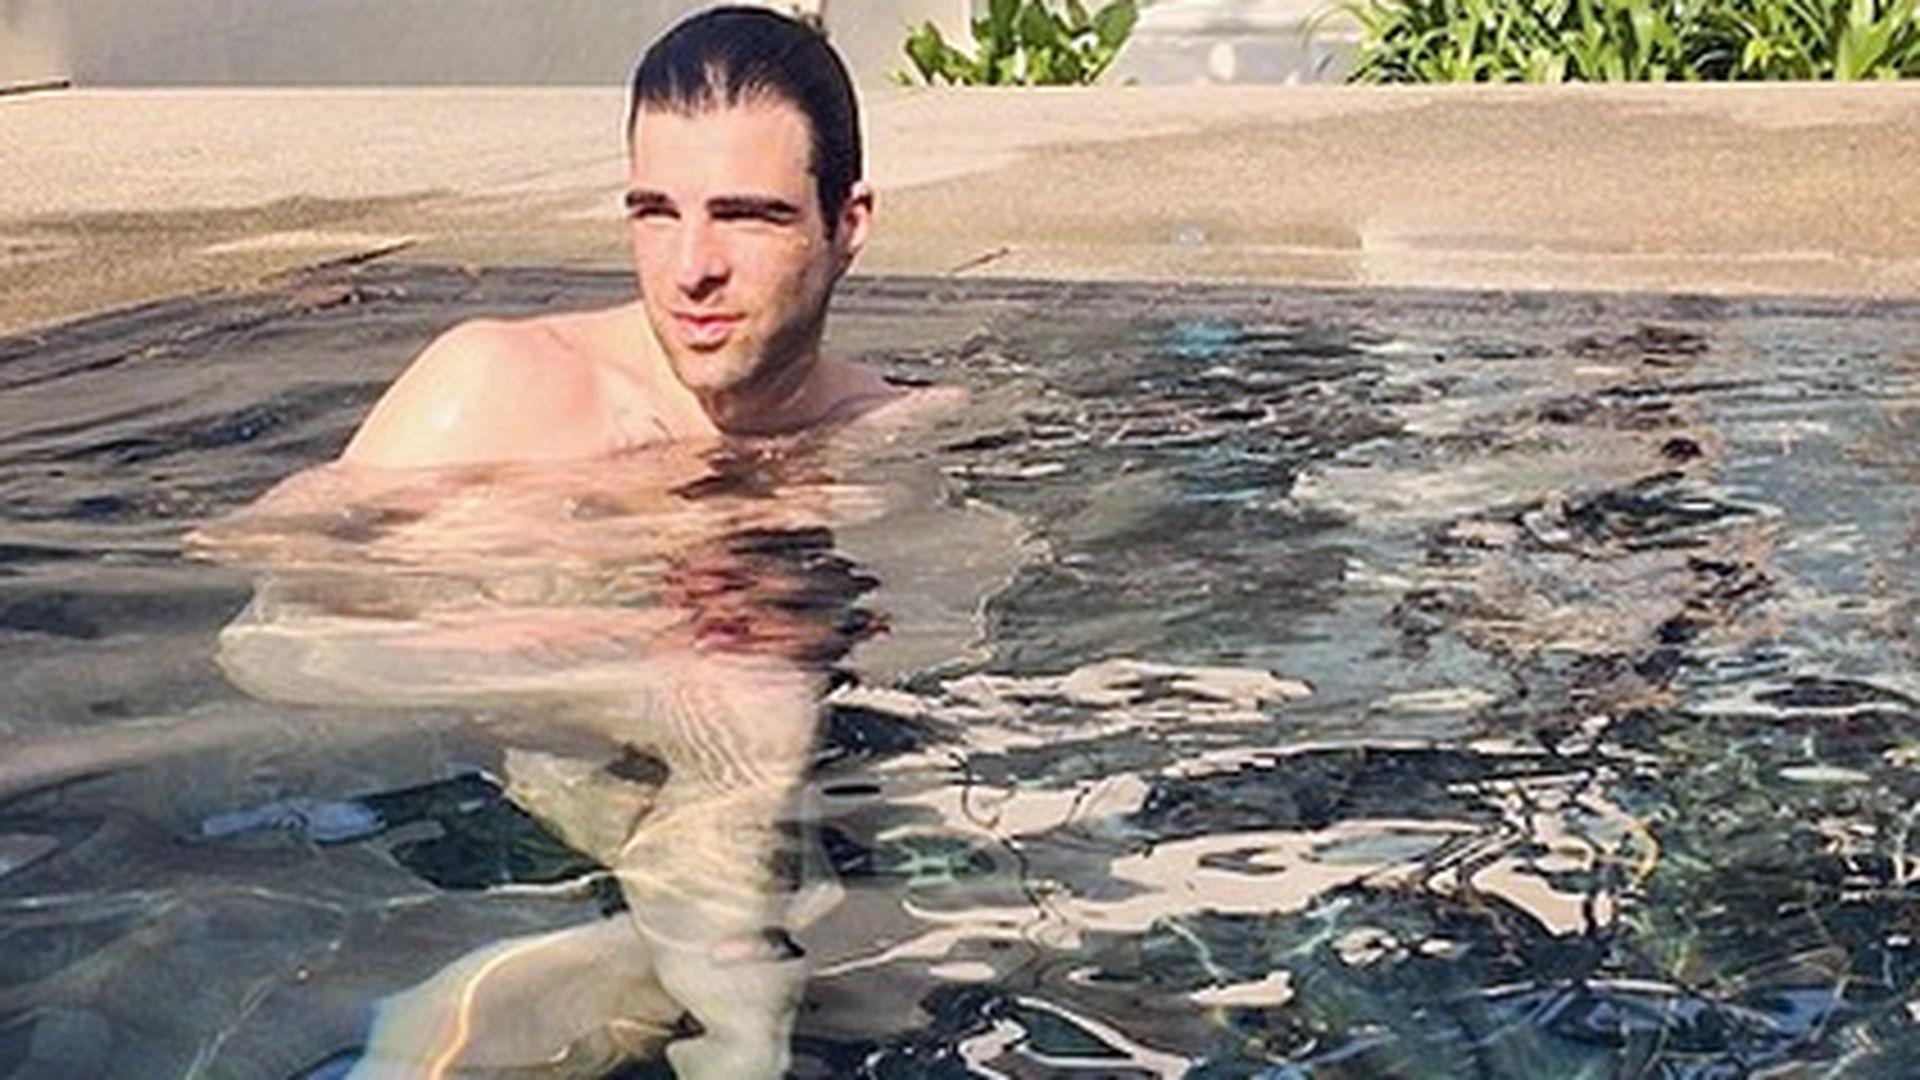 Nacktbaden im Pool: Zachary Quinto auf FKK-Kurs